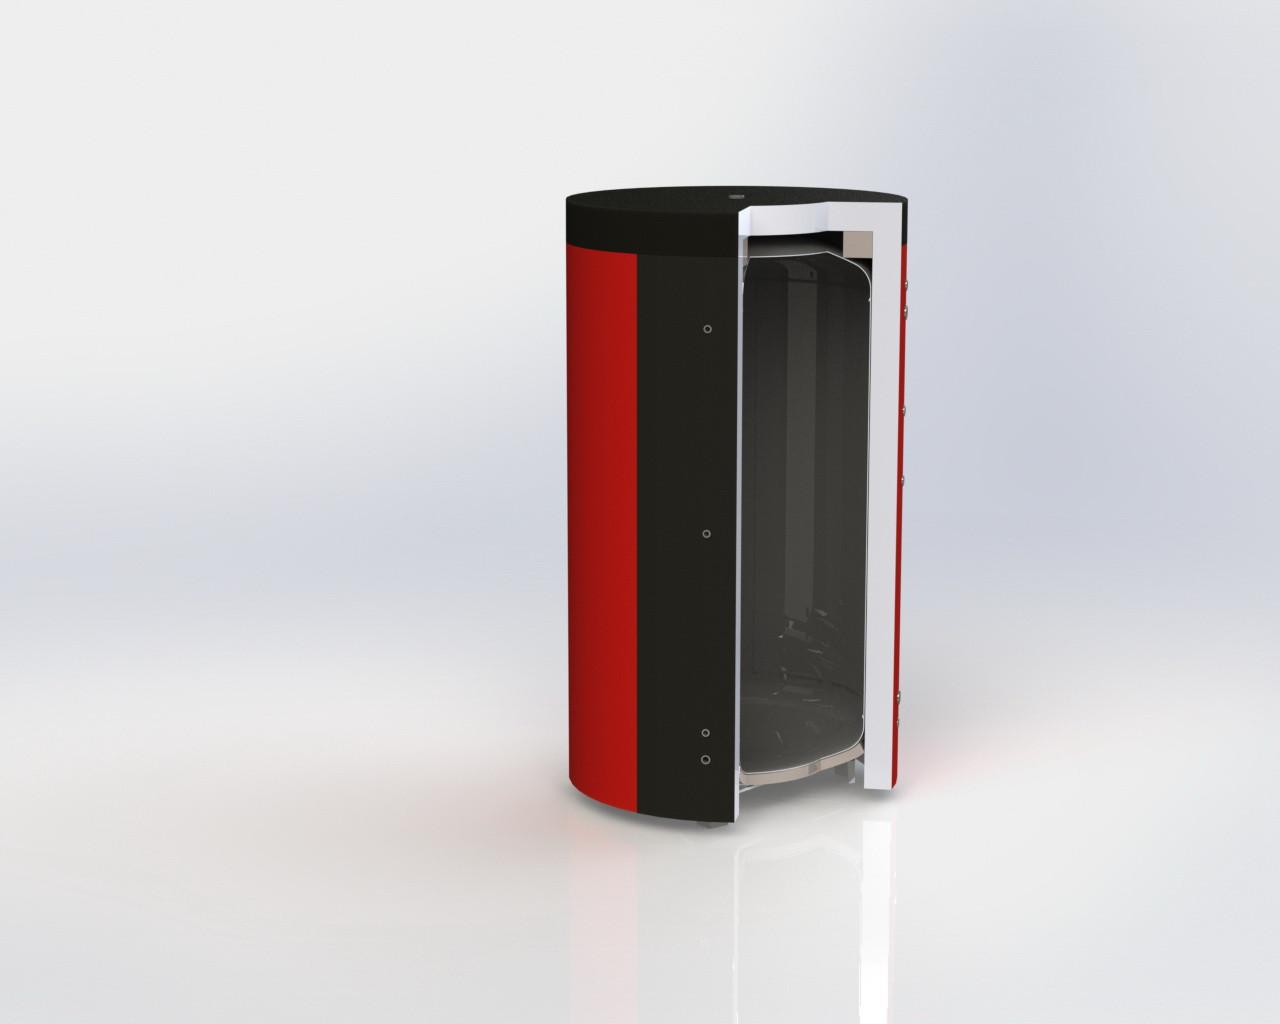 Теплоаккумулятор ЕА-00-3500 Куйдич с утеплителем 60 мм